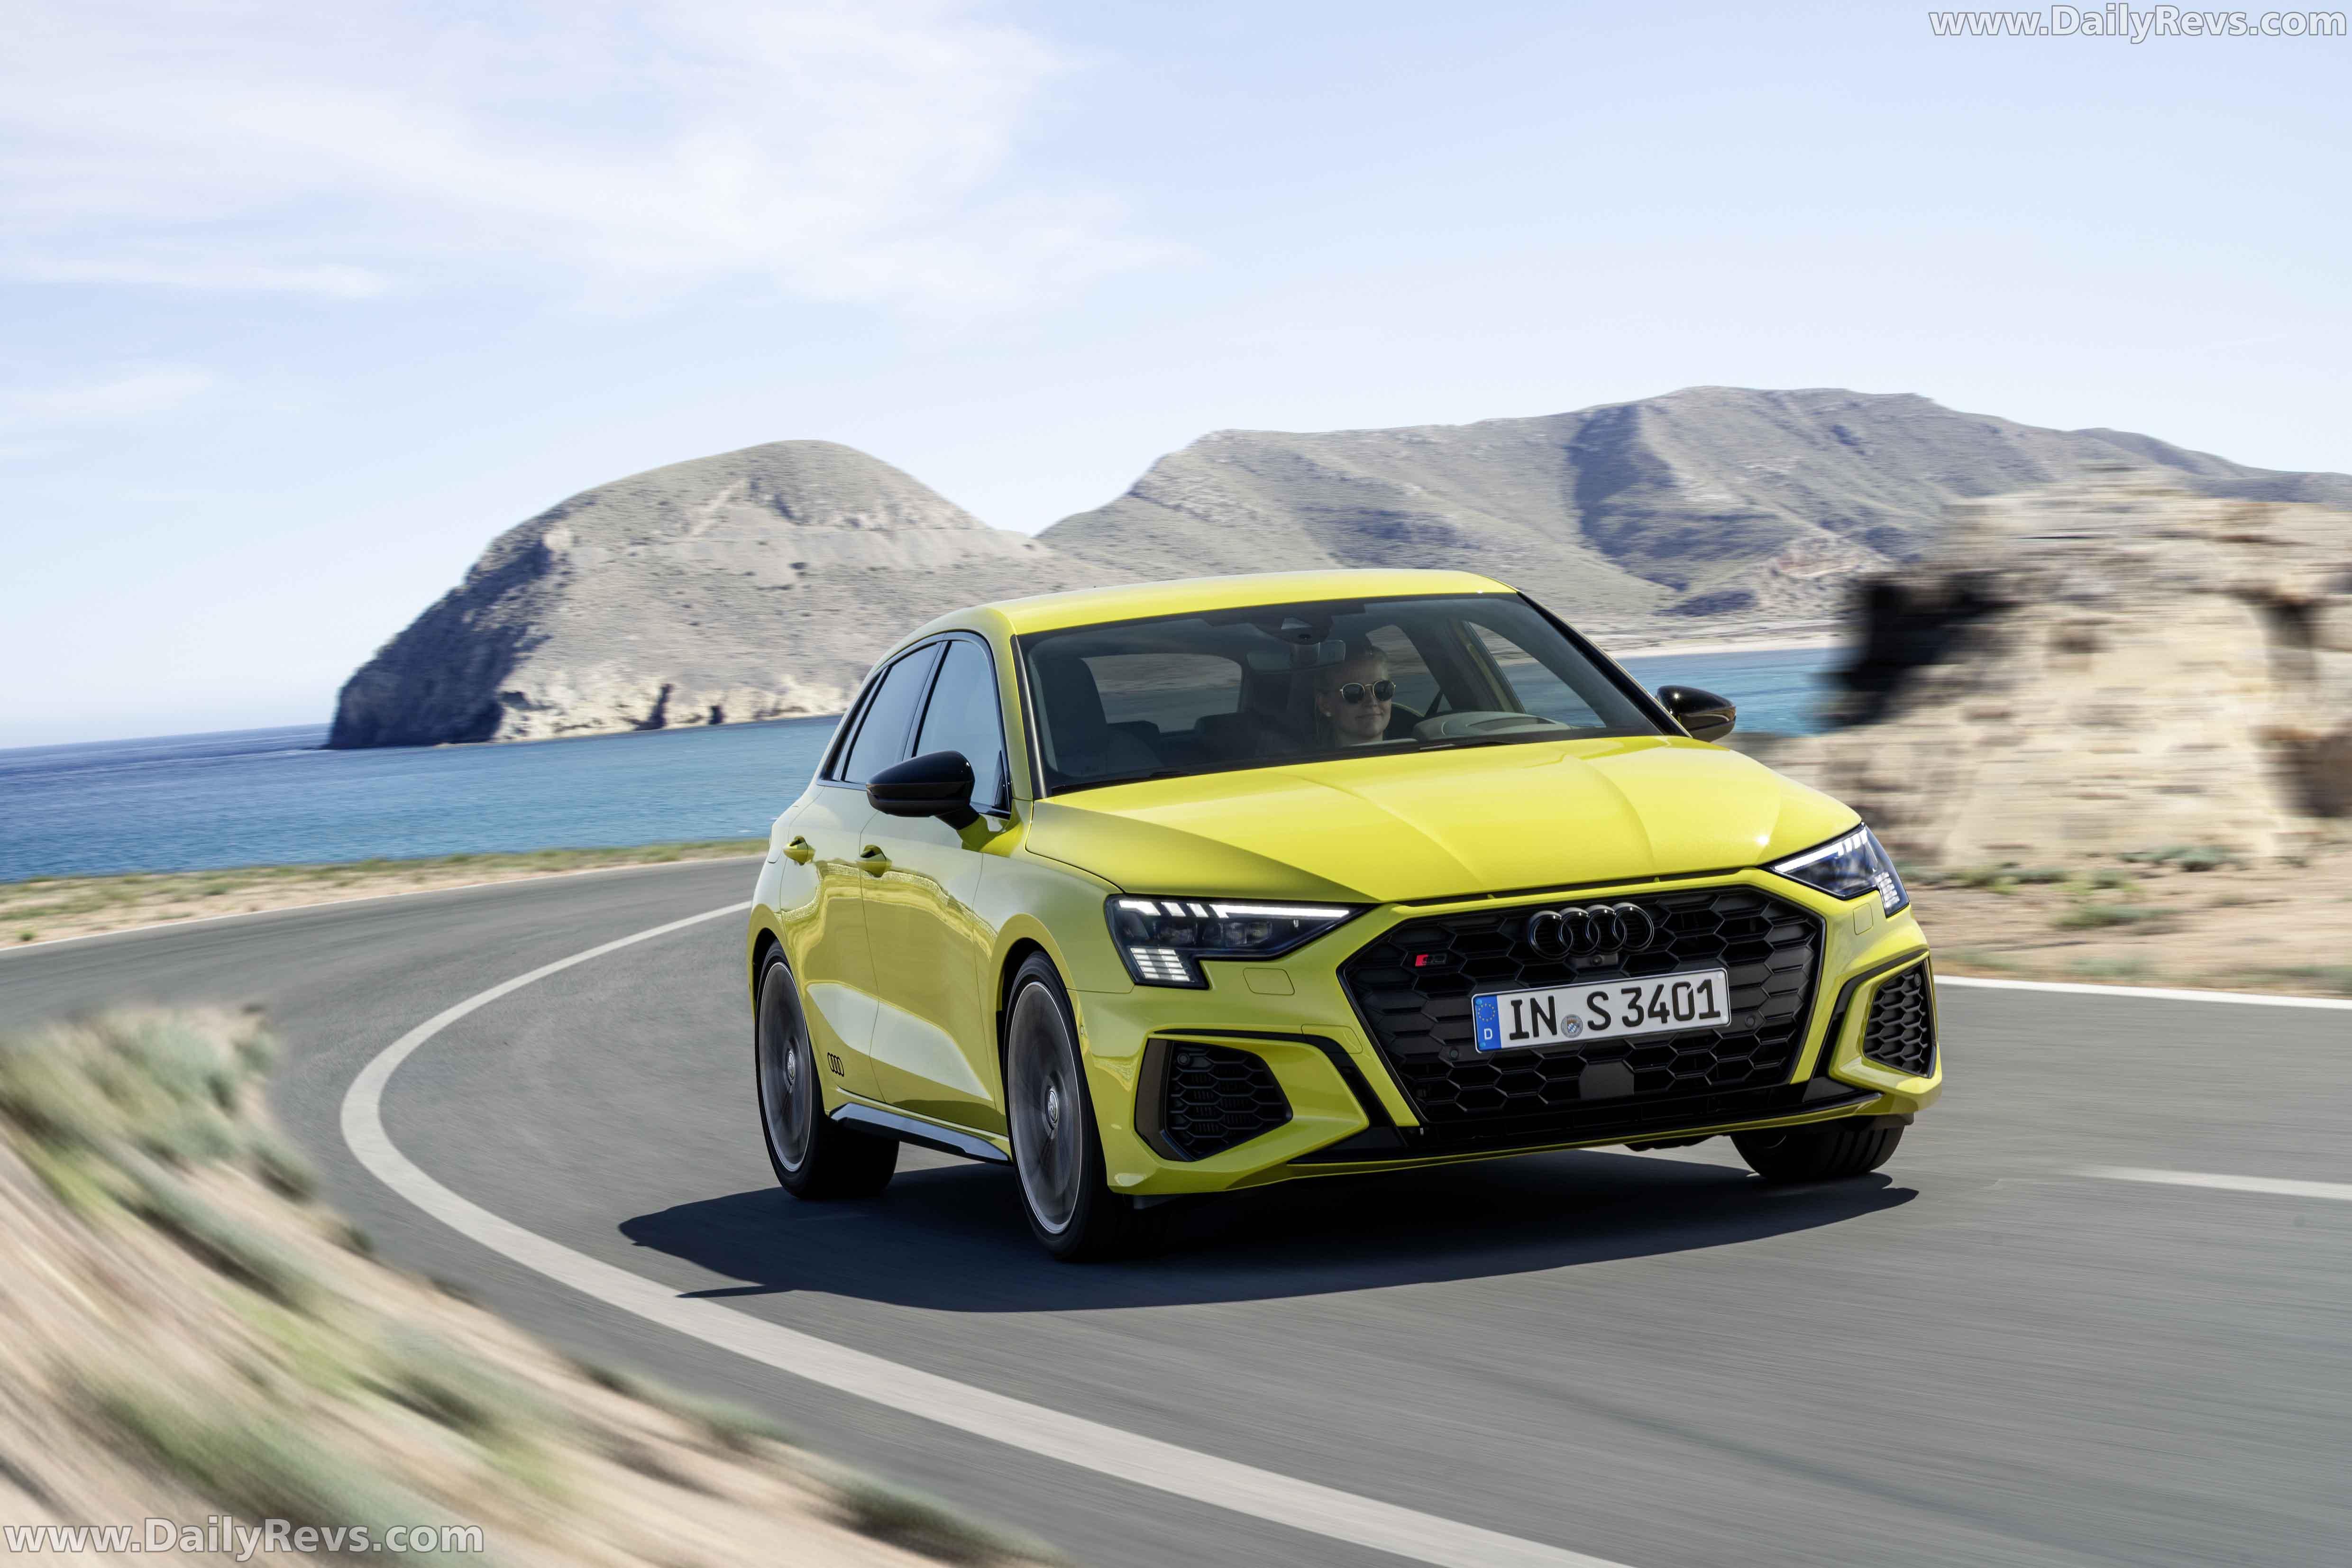 2021 Audi S3 Sportback - Dailyrevs